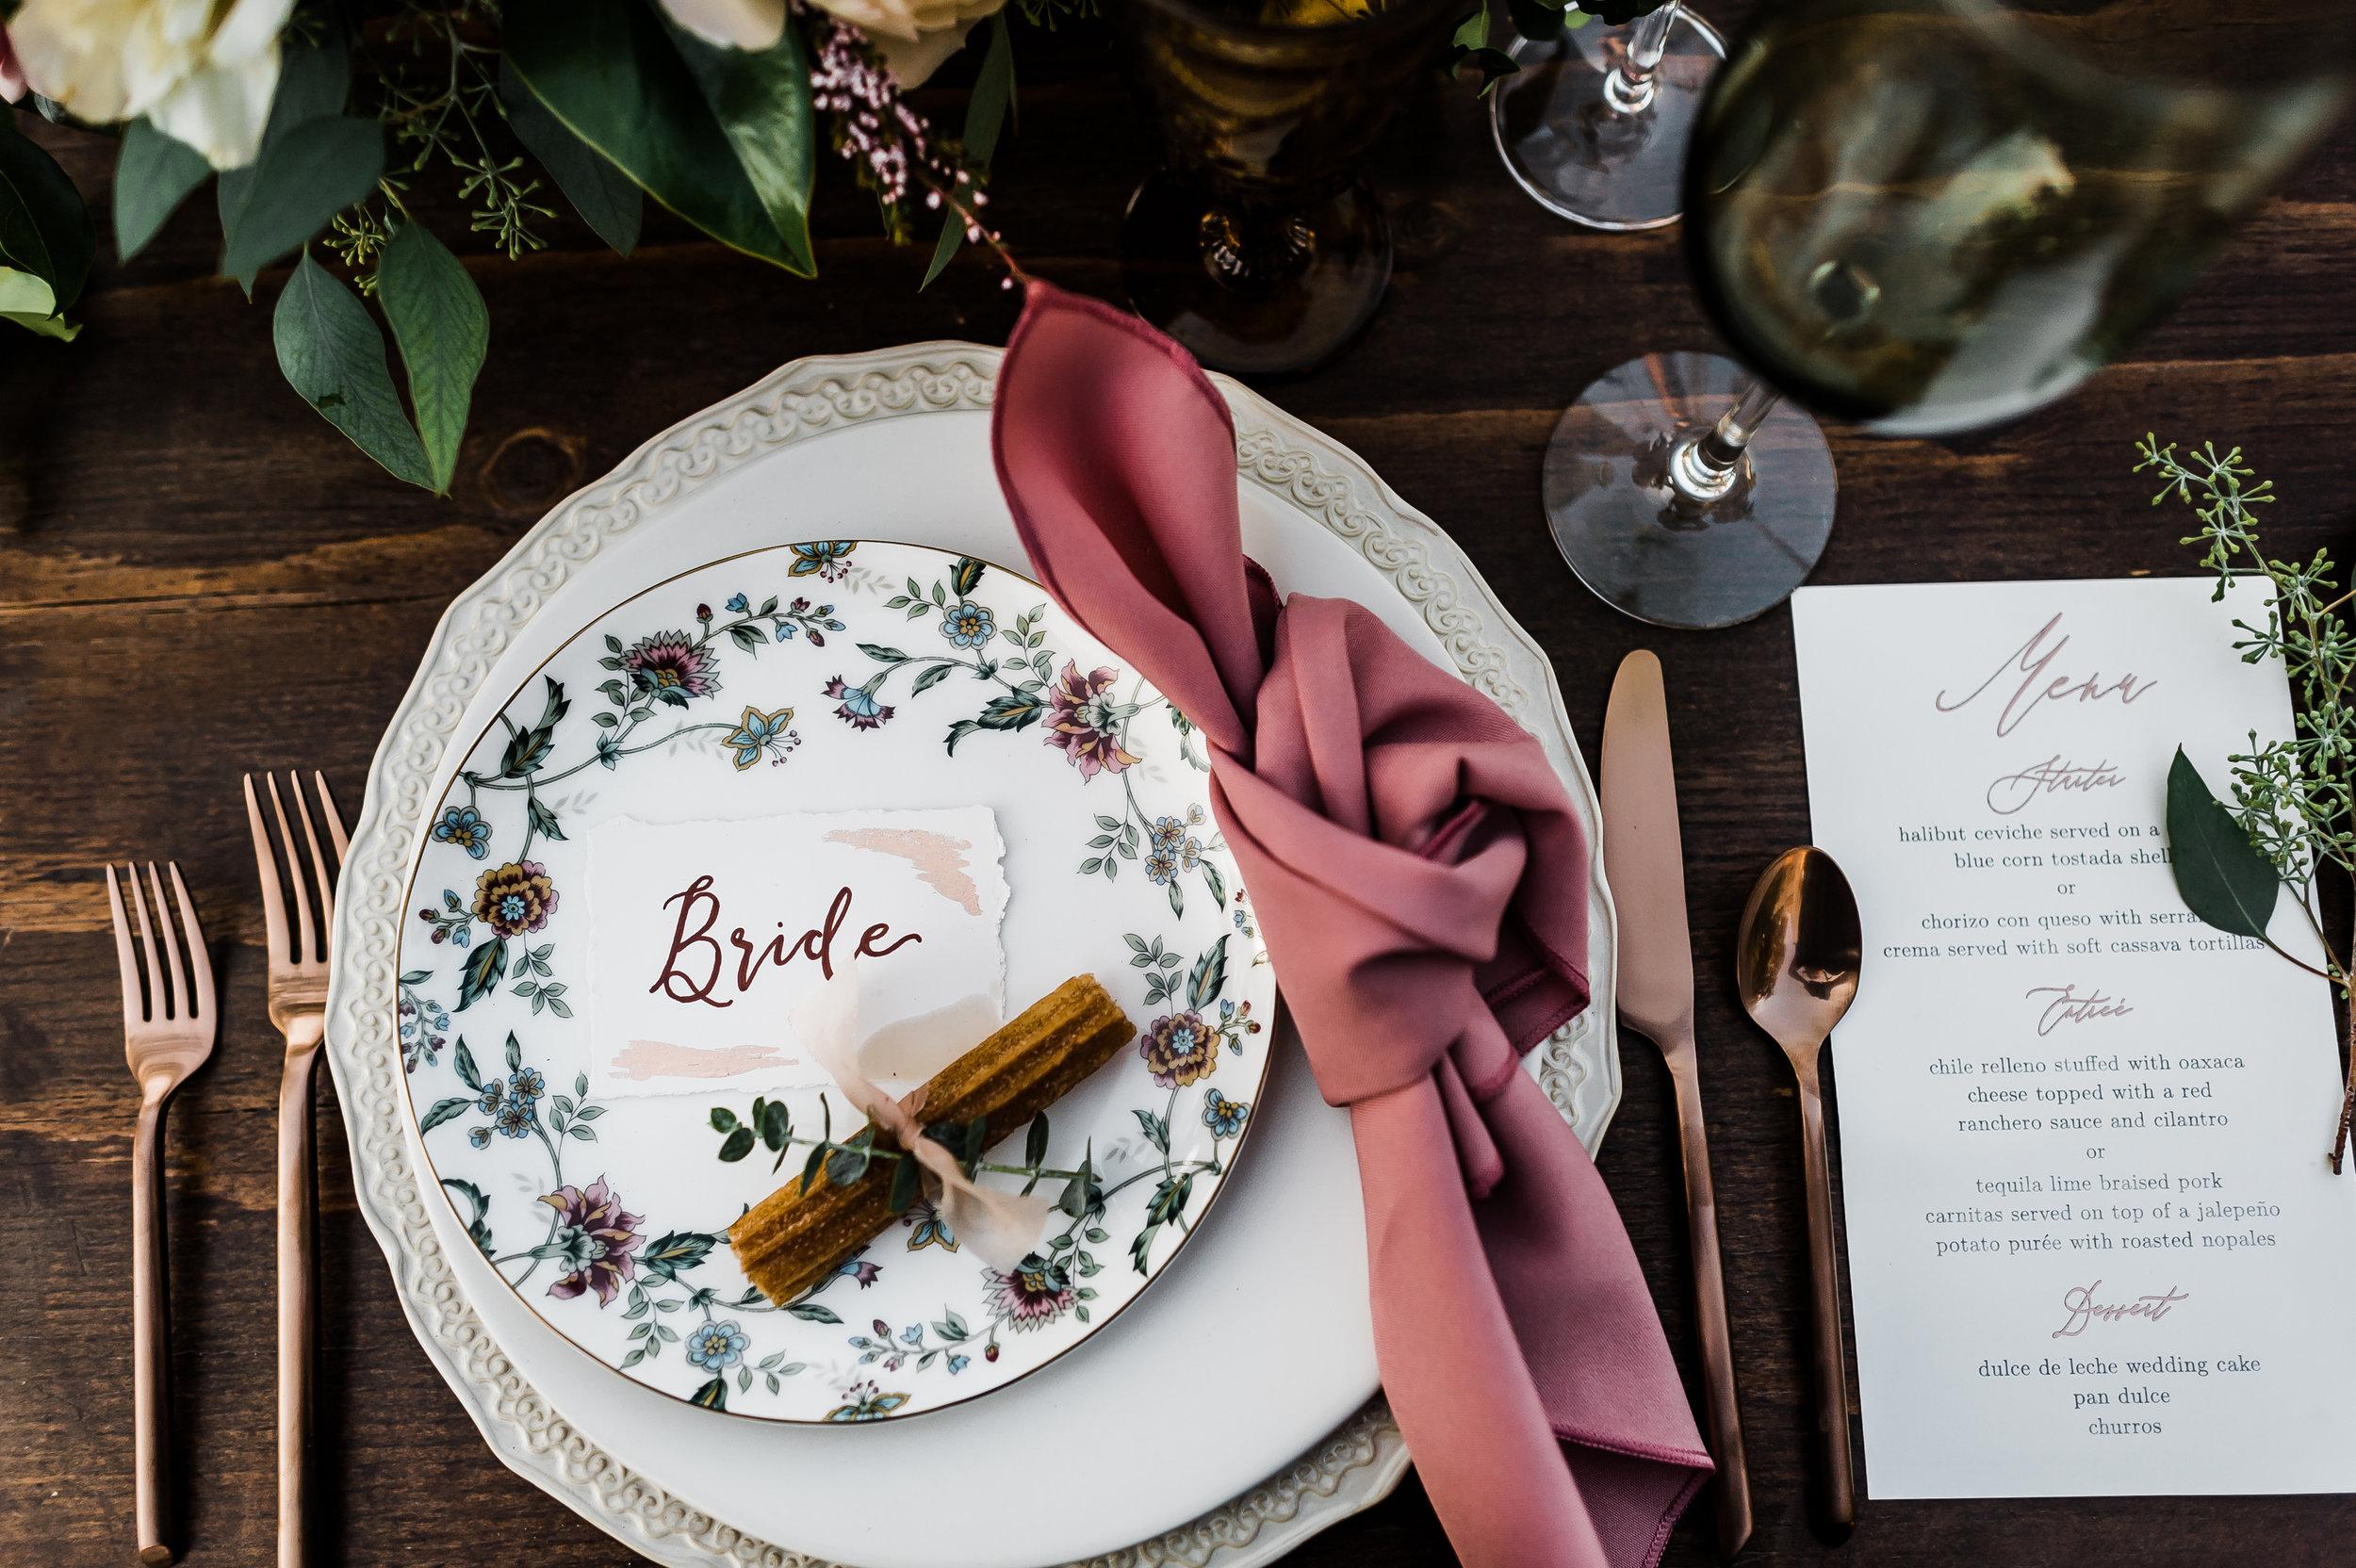 www.santabarbarawedding.com | Michelle Ramirez Photography | Olivas Adobe | Karen Marie Events | Tangled Lotus | Amigo Party Rentals | Dreams America Linens | Erickson Surfaces | Bride's Placesetting